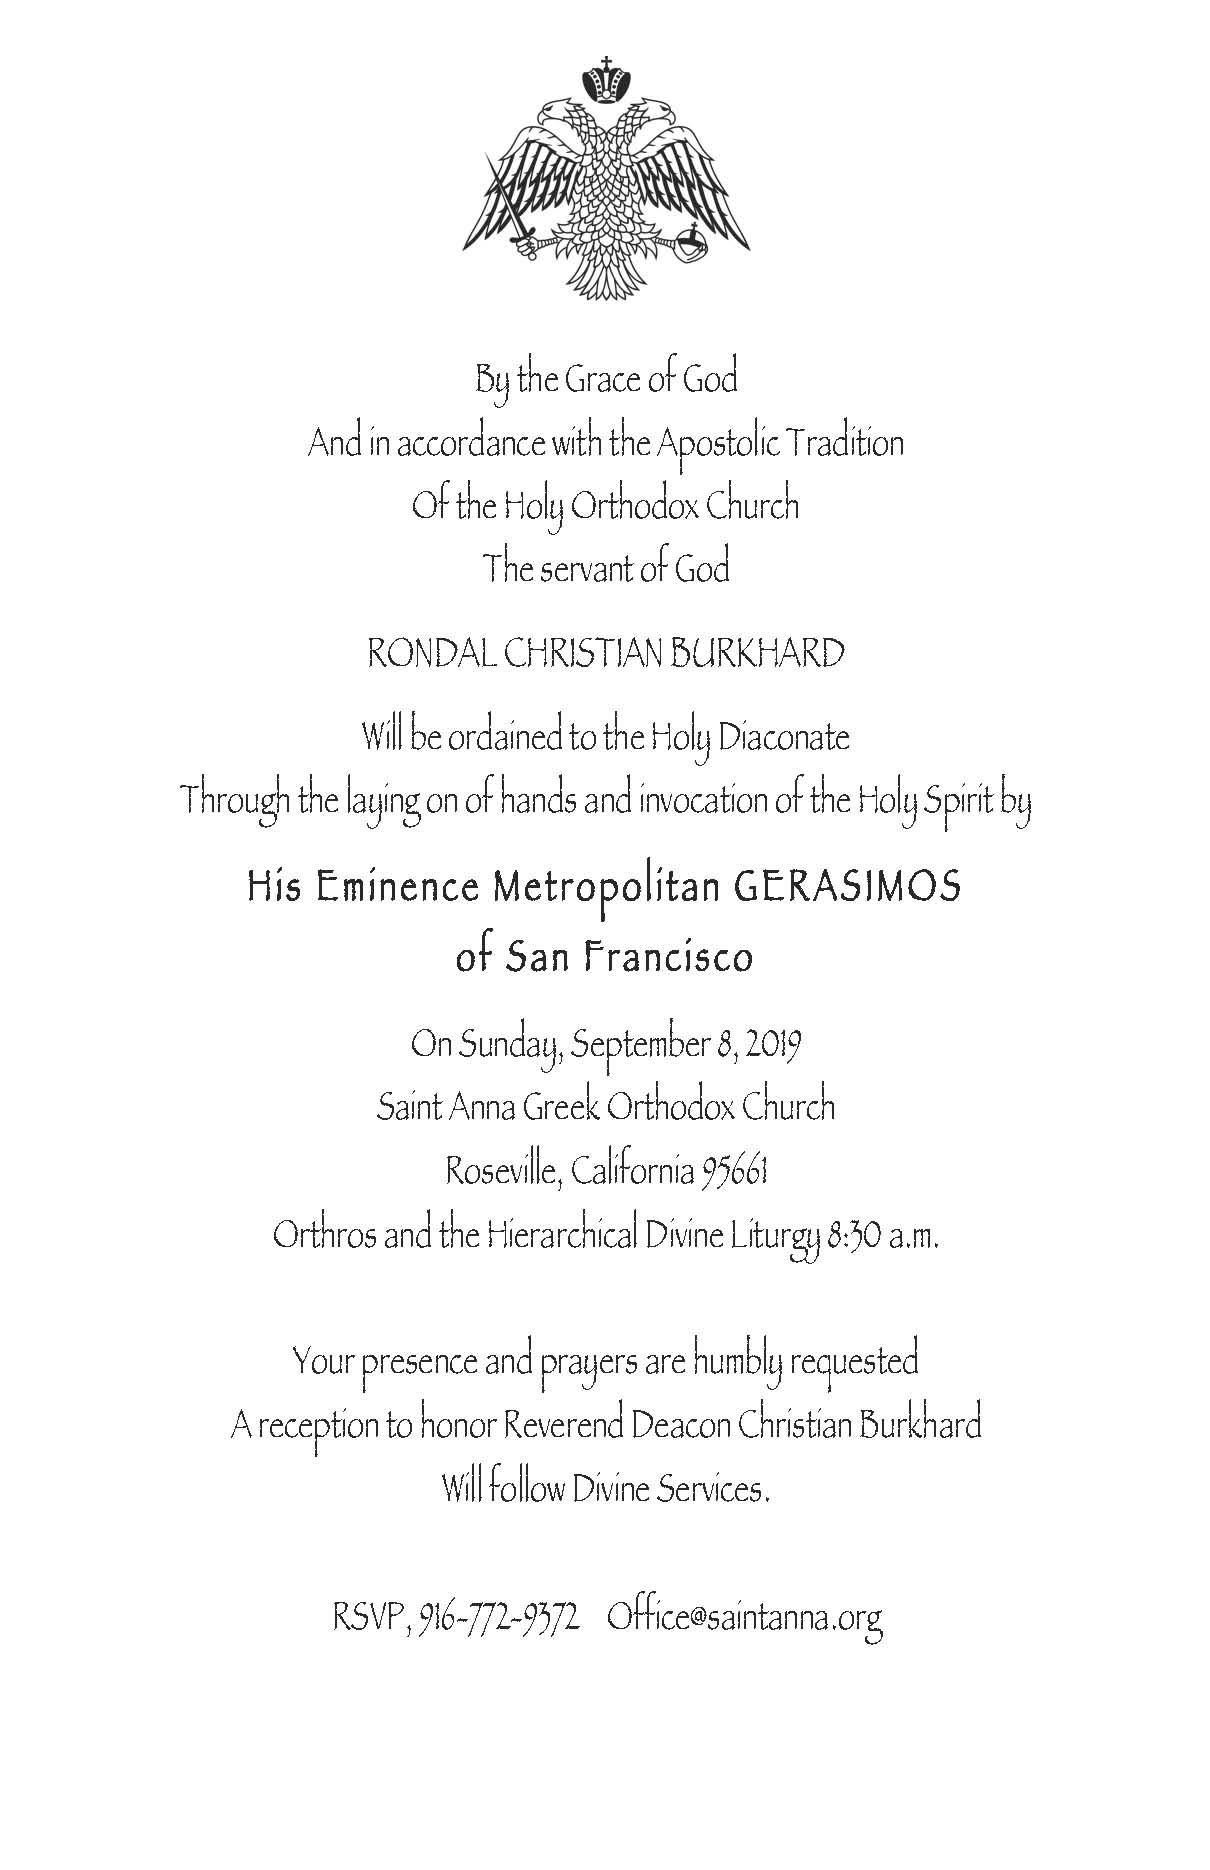 Burkhard Ordination Invite.jpg